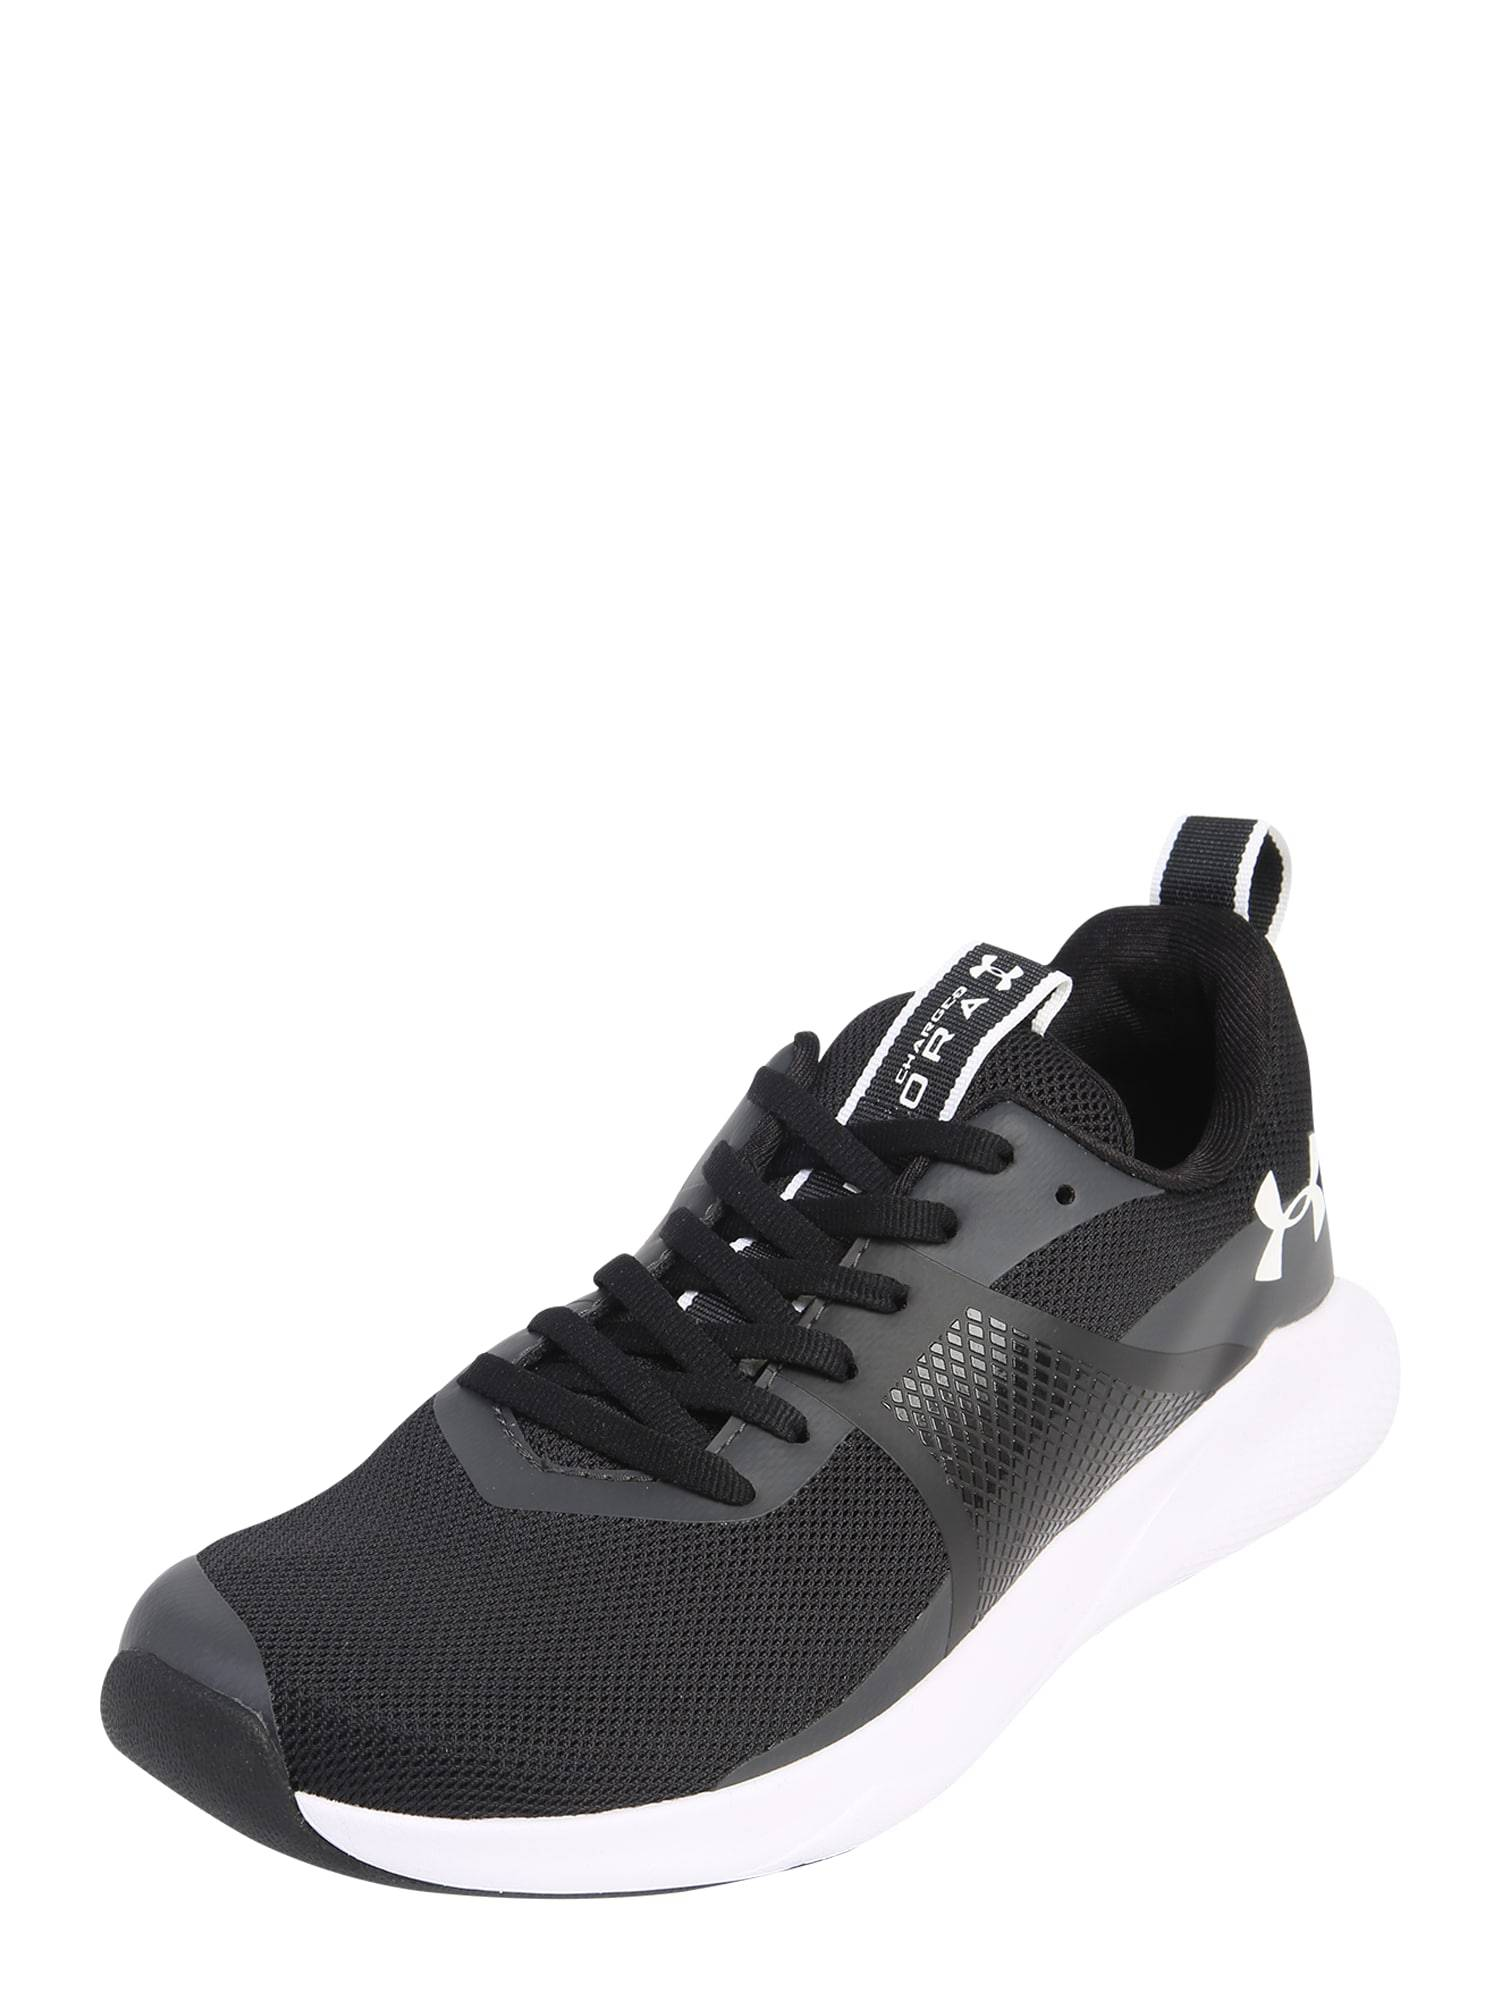 UNDER ARMOUR Chaussure de sport 'Aurora'  - Noir - Taille: 9.5 - female